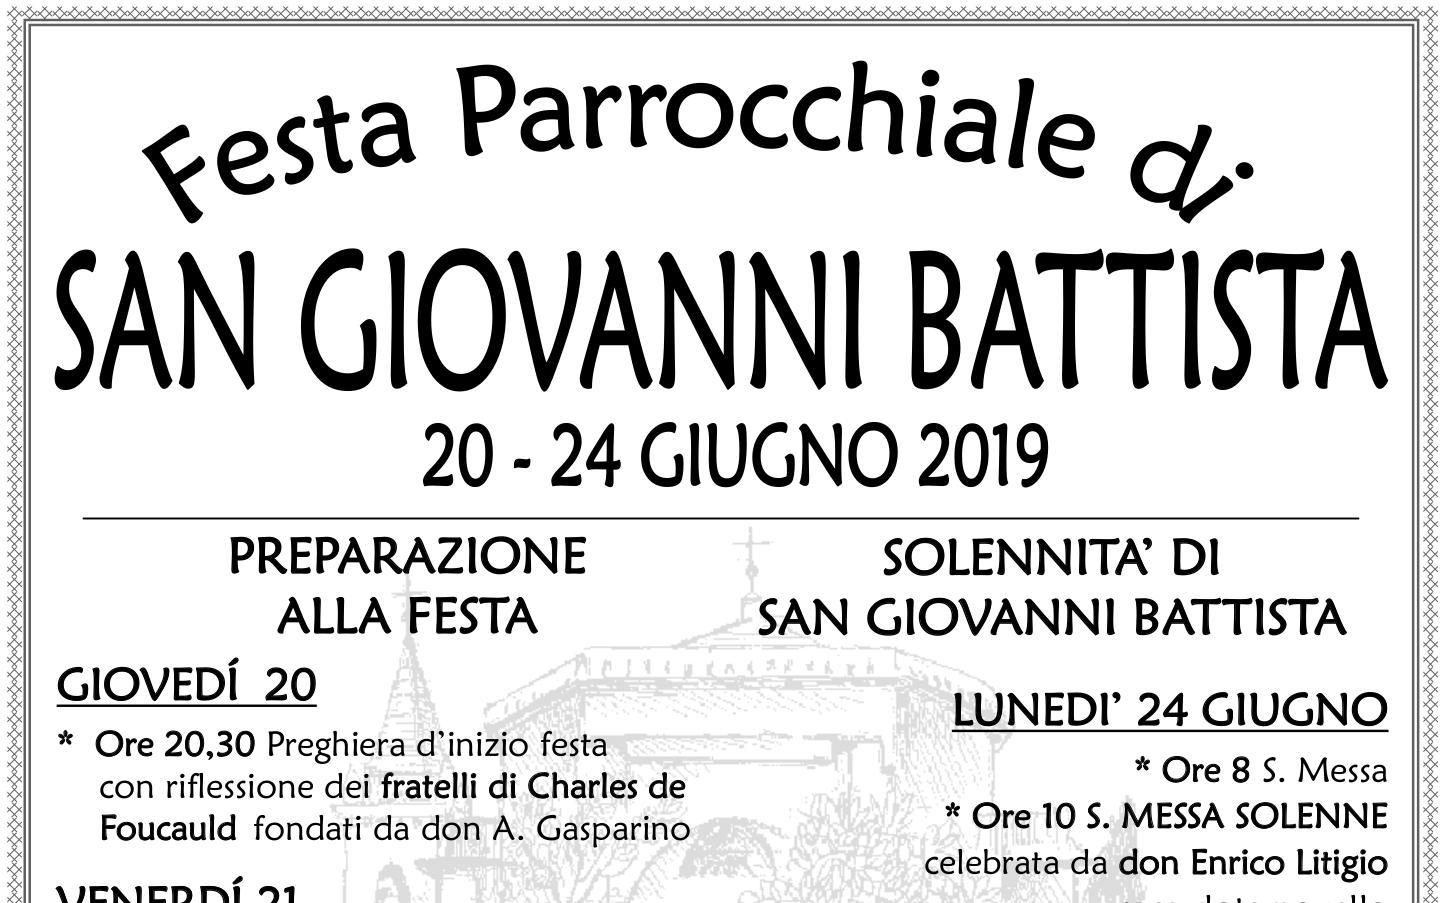 Programma Festa Patronale 2019